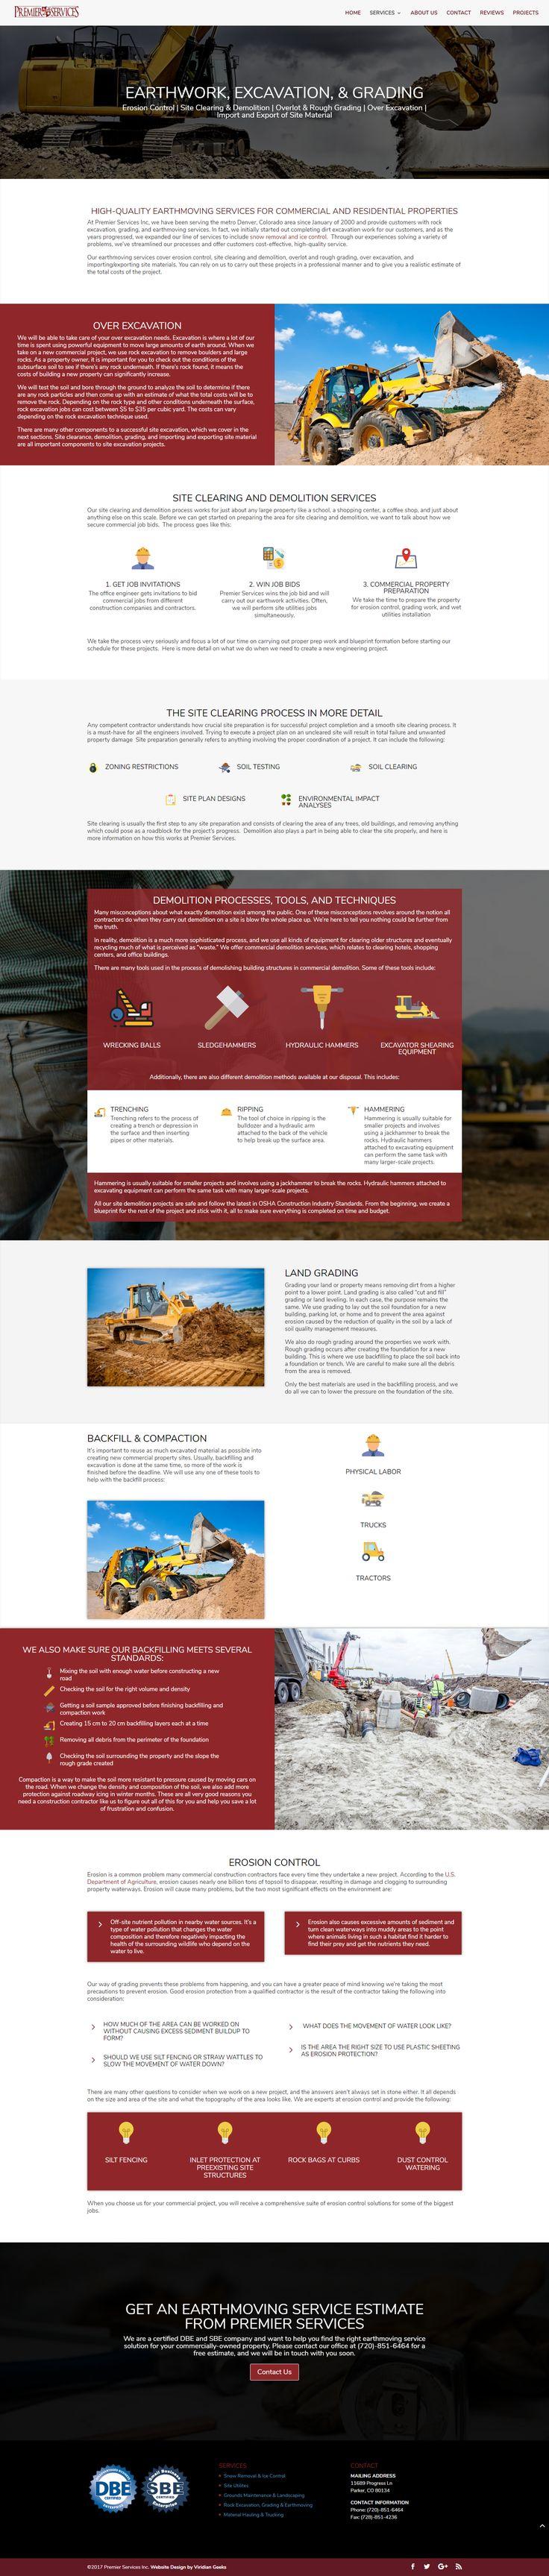 Viridian Geeks web design for Premier Services, Inc's excavation service page.